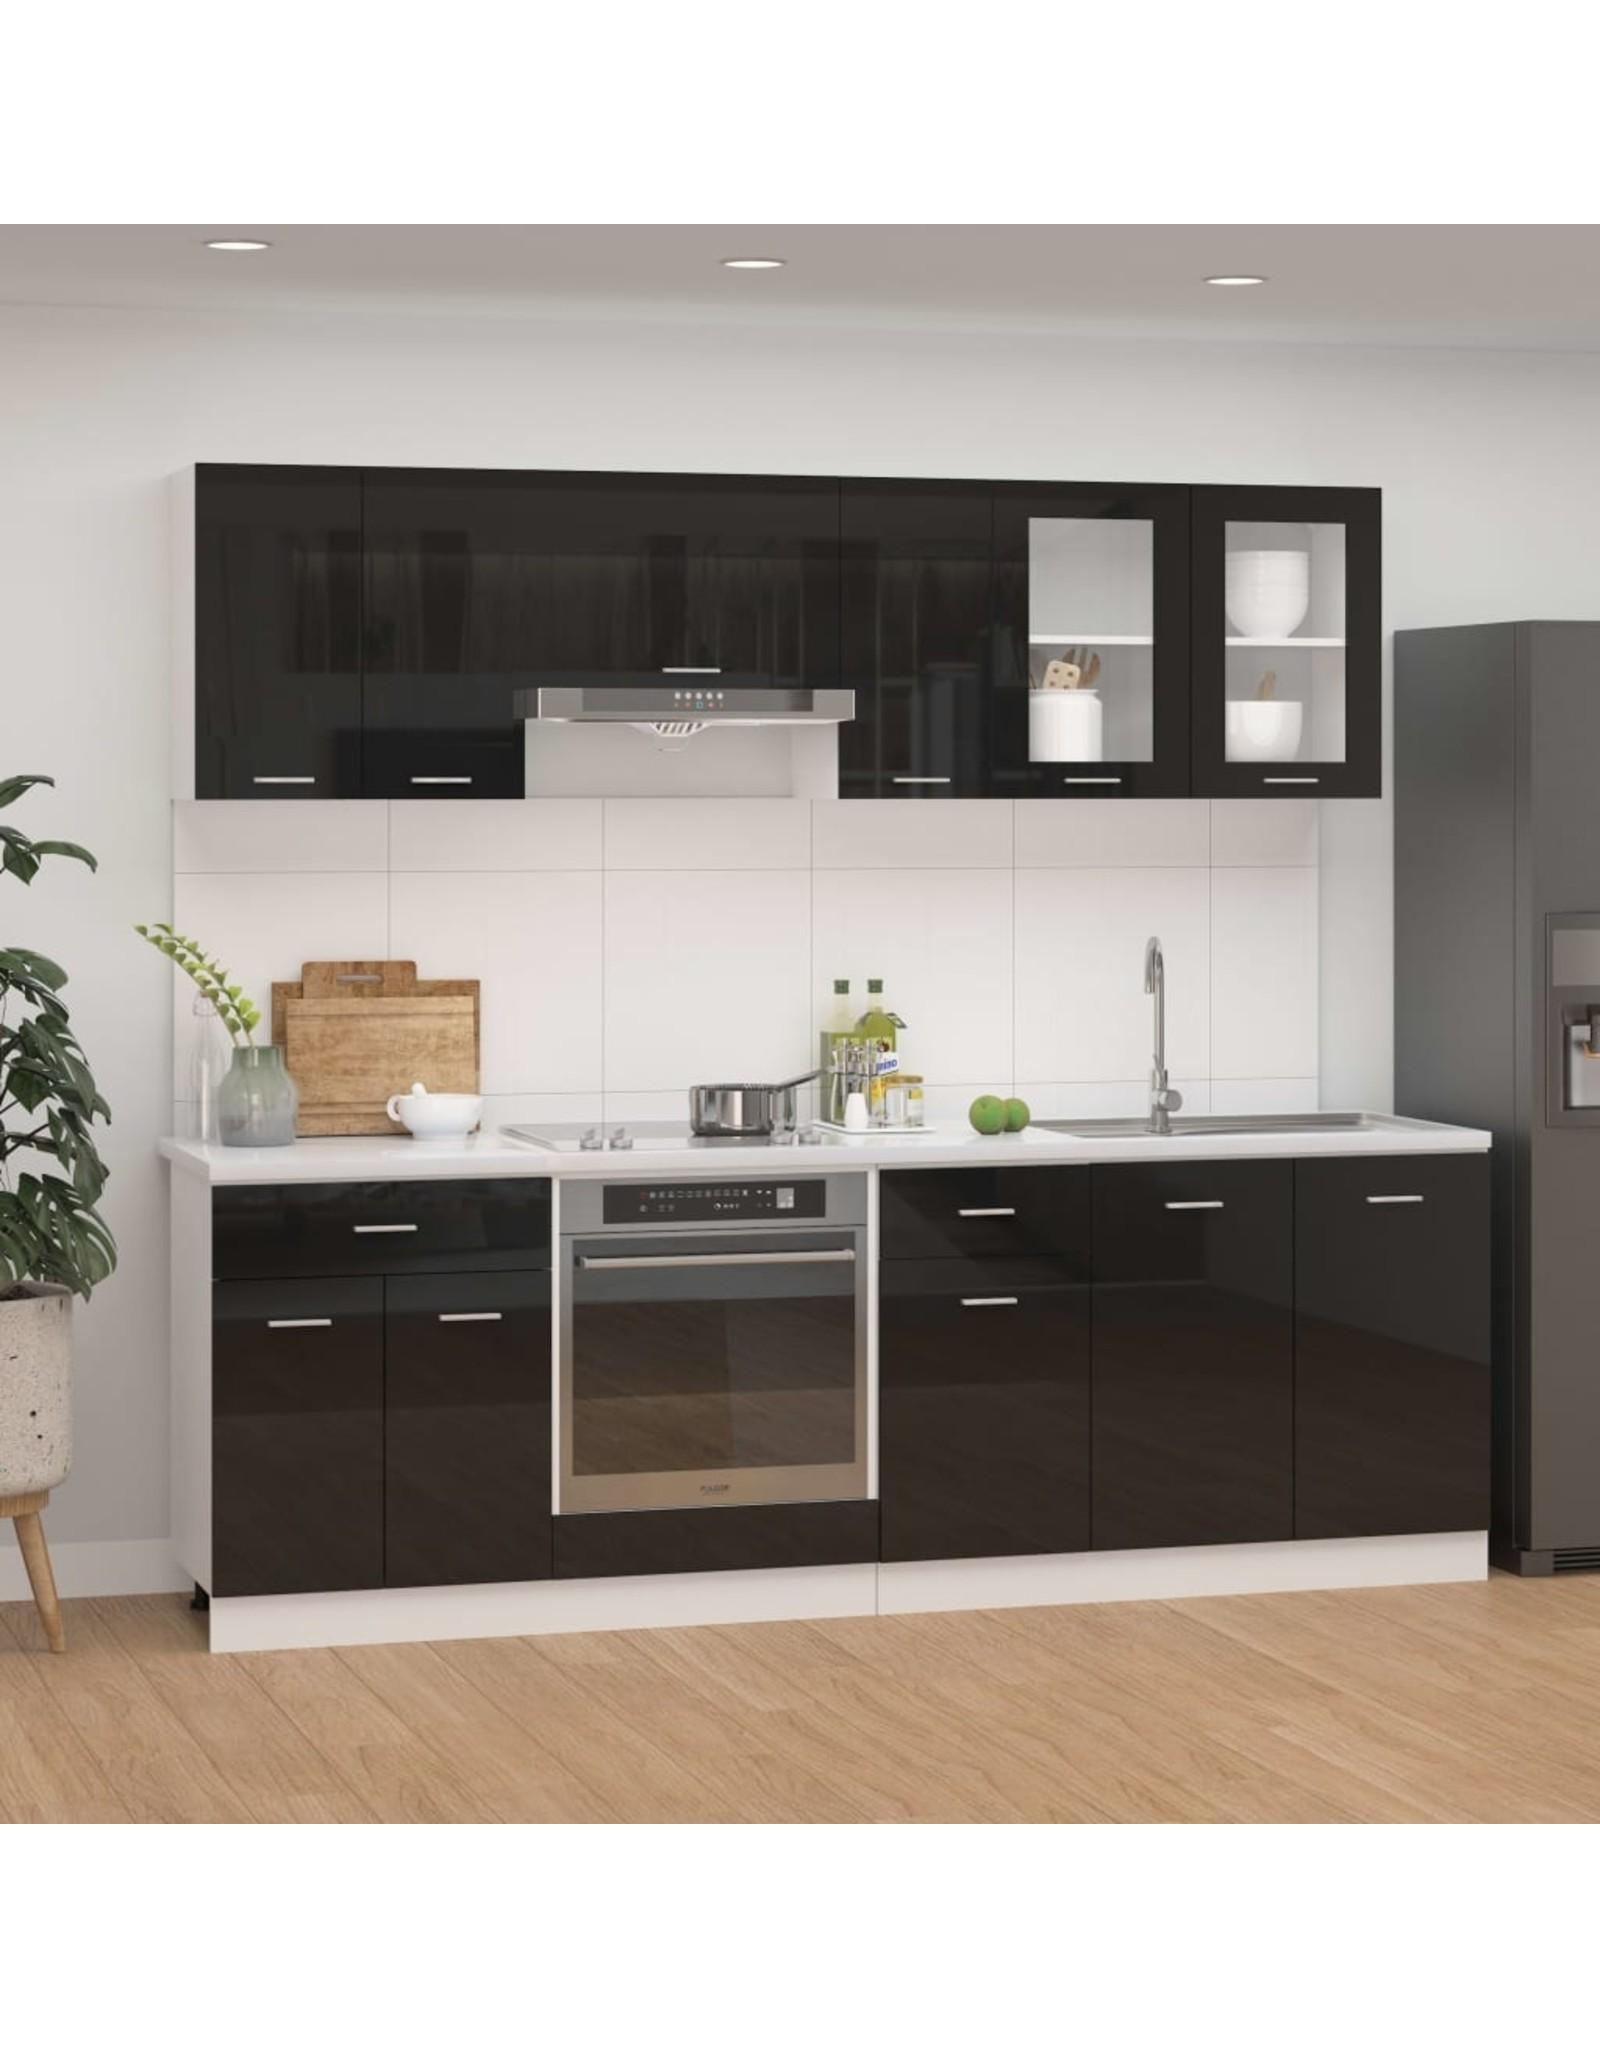 8-delige Keukenkastenset spaanplaat hoogglans zwart